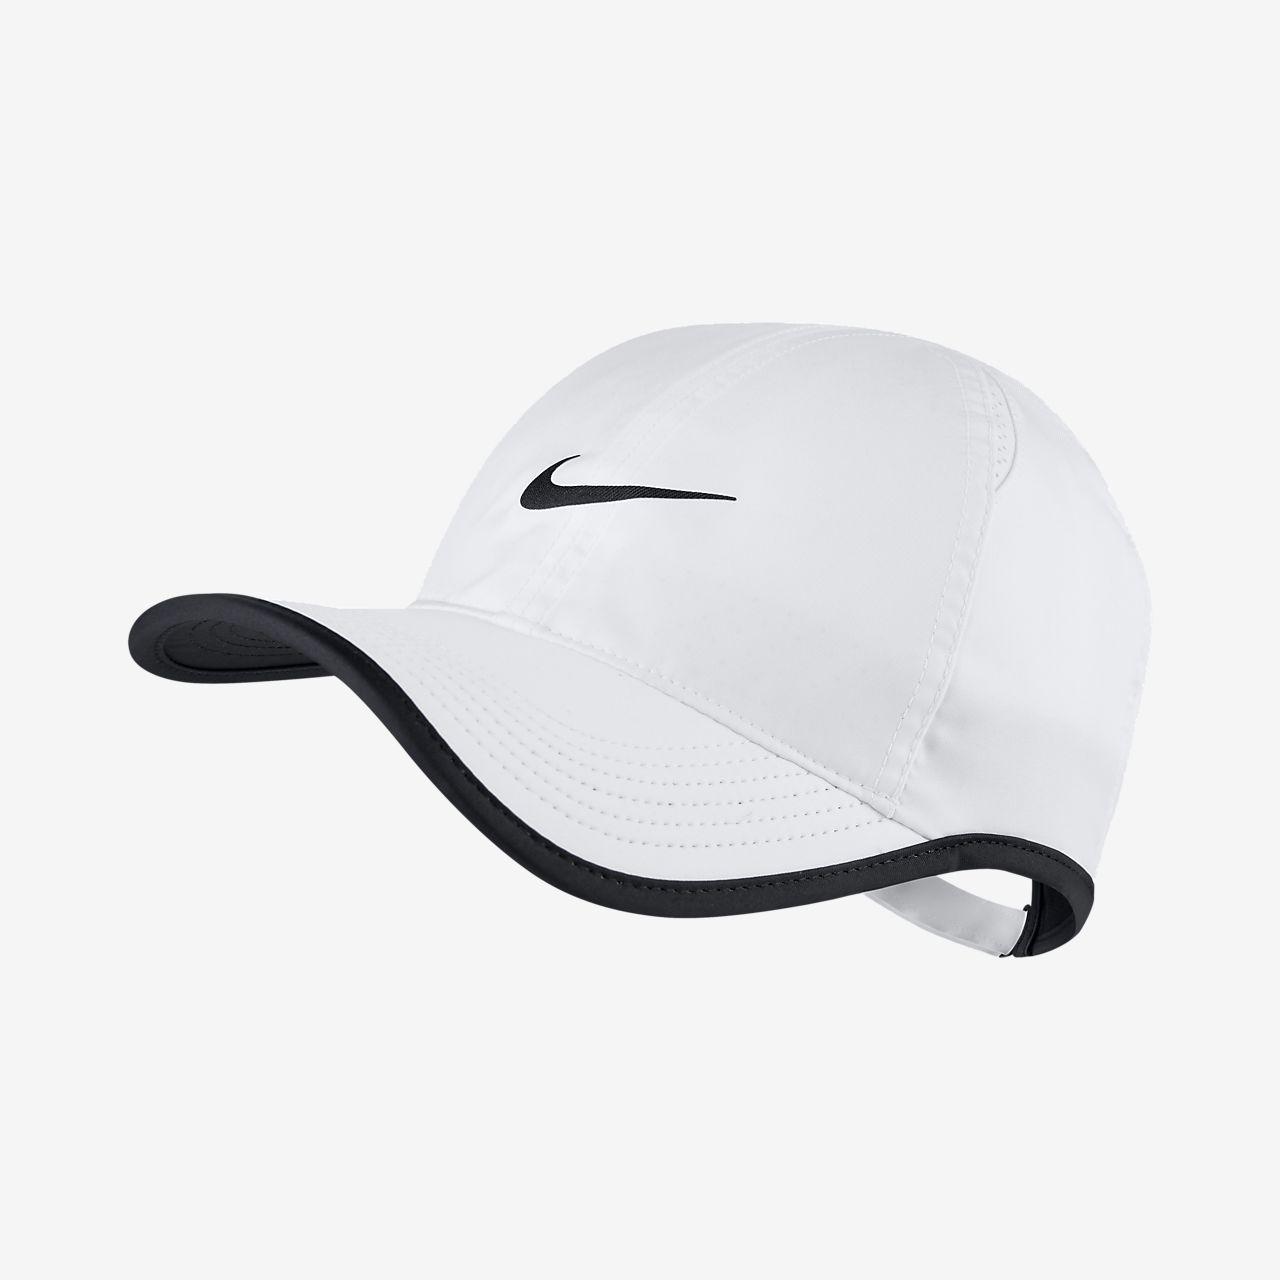 Nike Sportswear Aerobill Featherlight Adjustable Cap Nike Com Nike Sportswear Nike Adjustable Cap